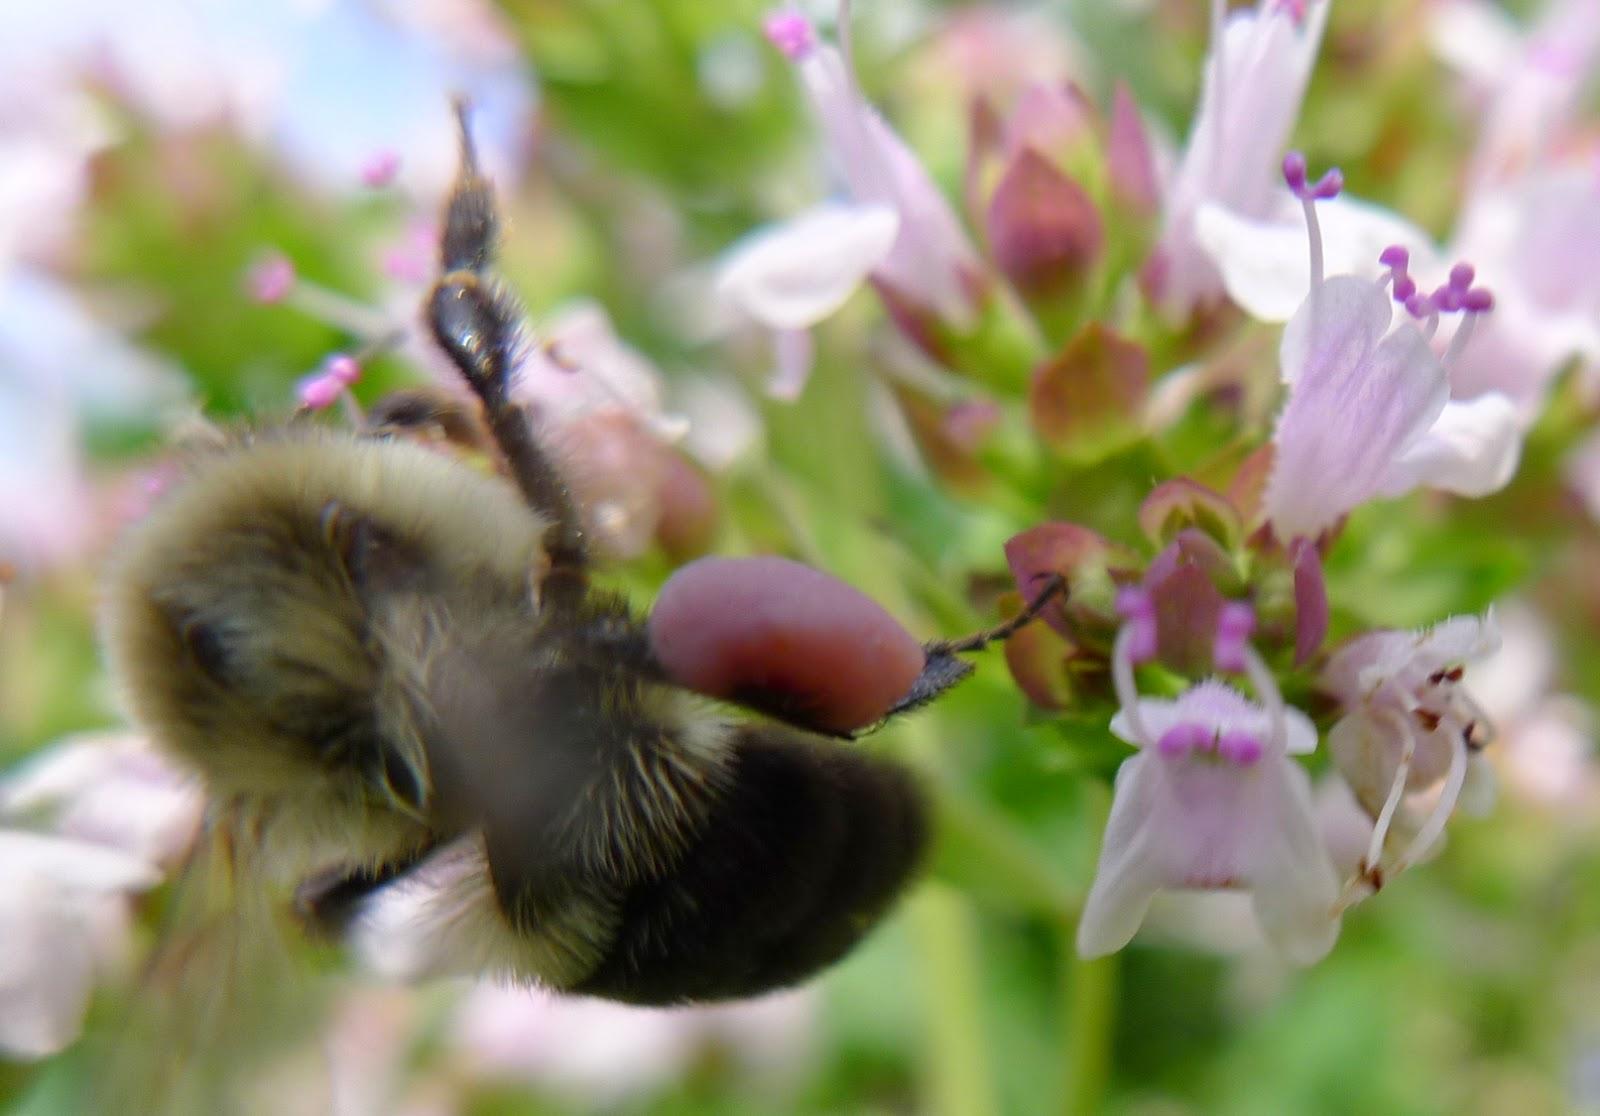 Bumble Bee on oregano, pollinators, urban farming